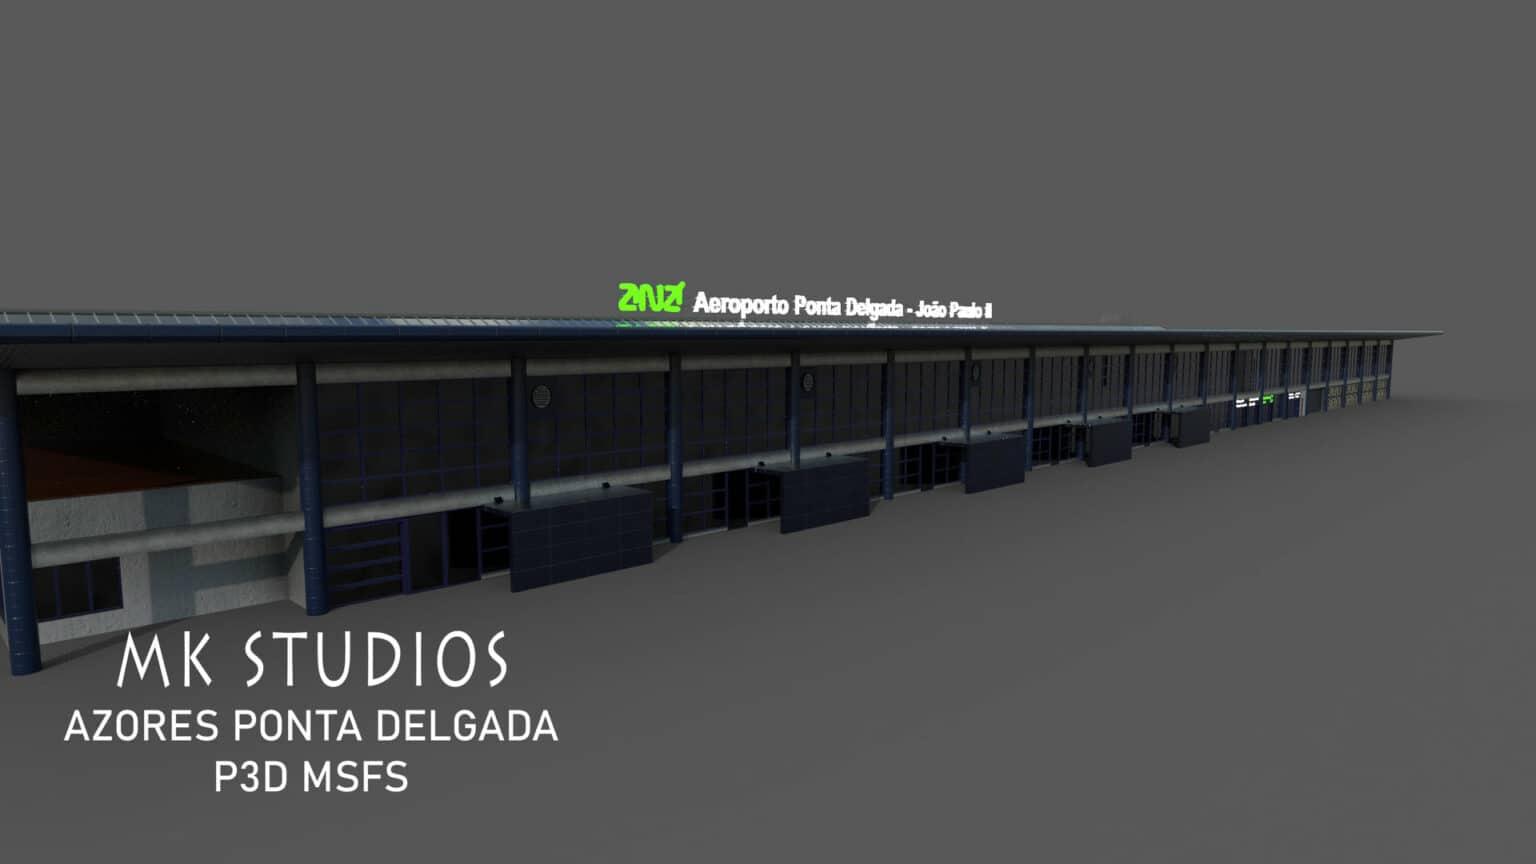 MK-Stduios_Update_Roadmap (3)